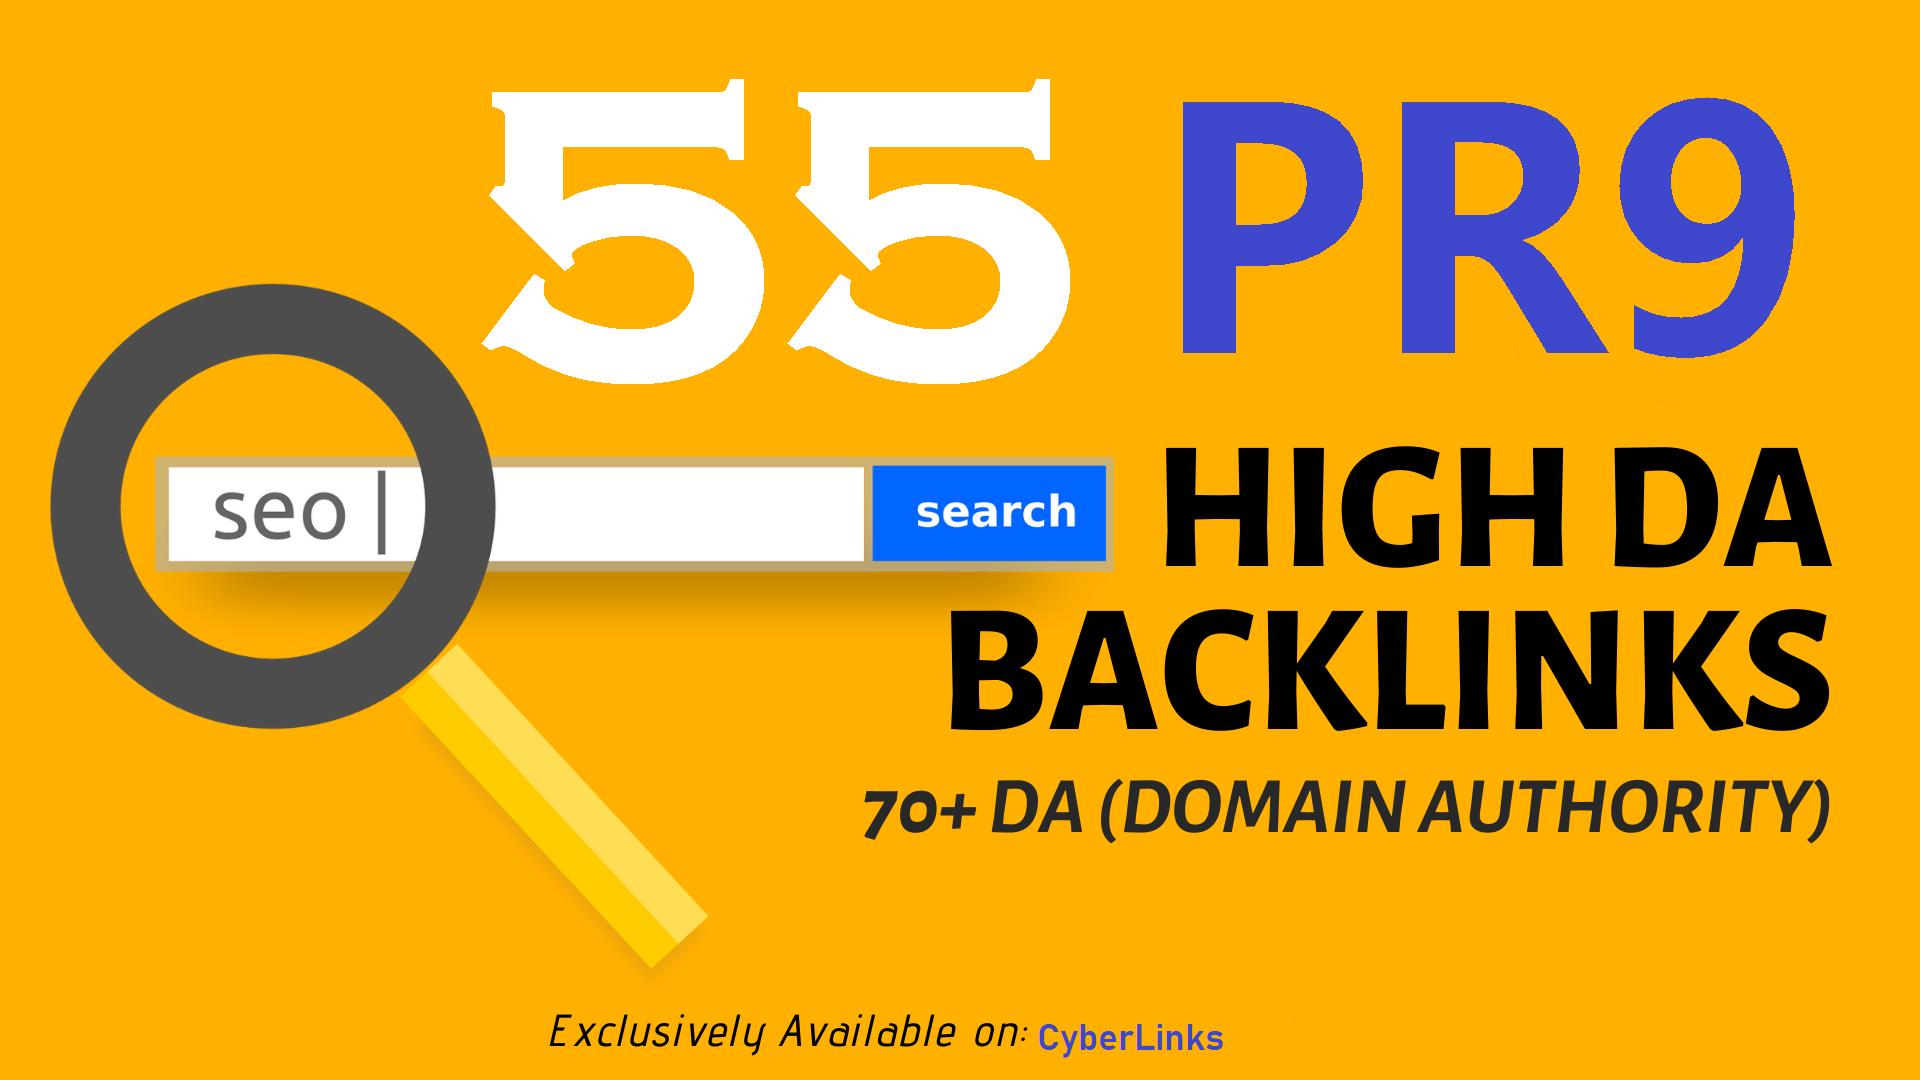 I Will Do 55 PR-9 QUALITY Backlinks from TOP 90+DA High Authority Sites Google Friendly SEO Links